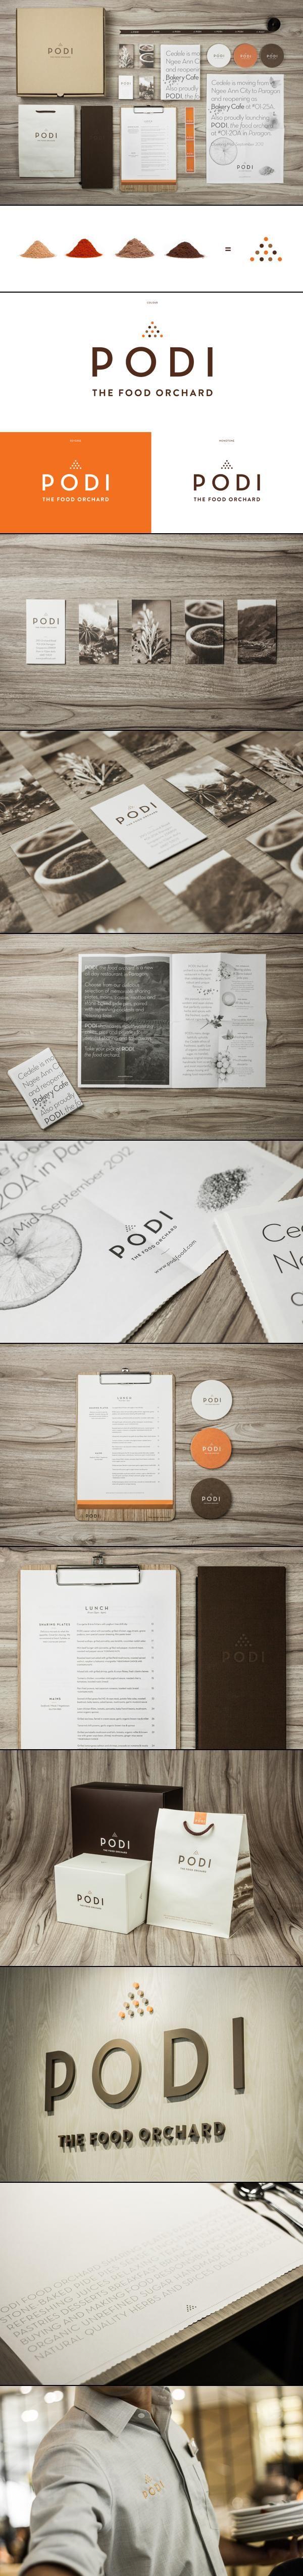 <> PODI | #stationary #corporate #design #corporatedesign #identity #branding #marketing < repinned by www.BlickeDeeler.de | Take a look at www.LogoGestaltung-Hamburg.de